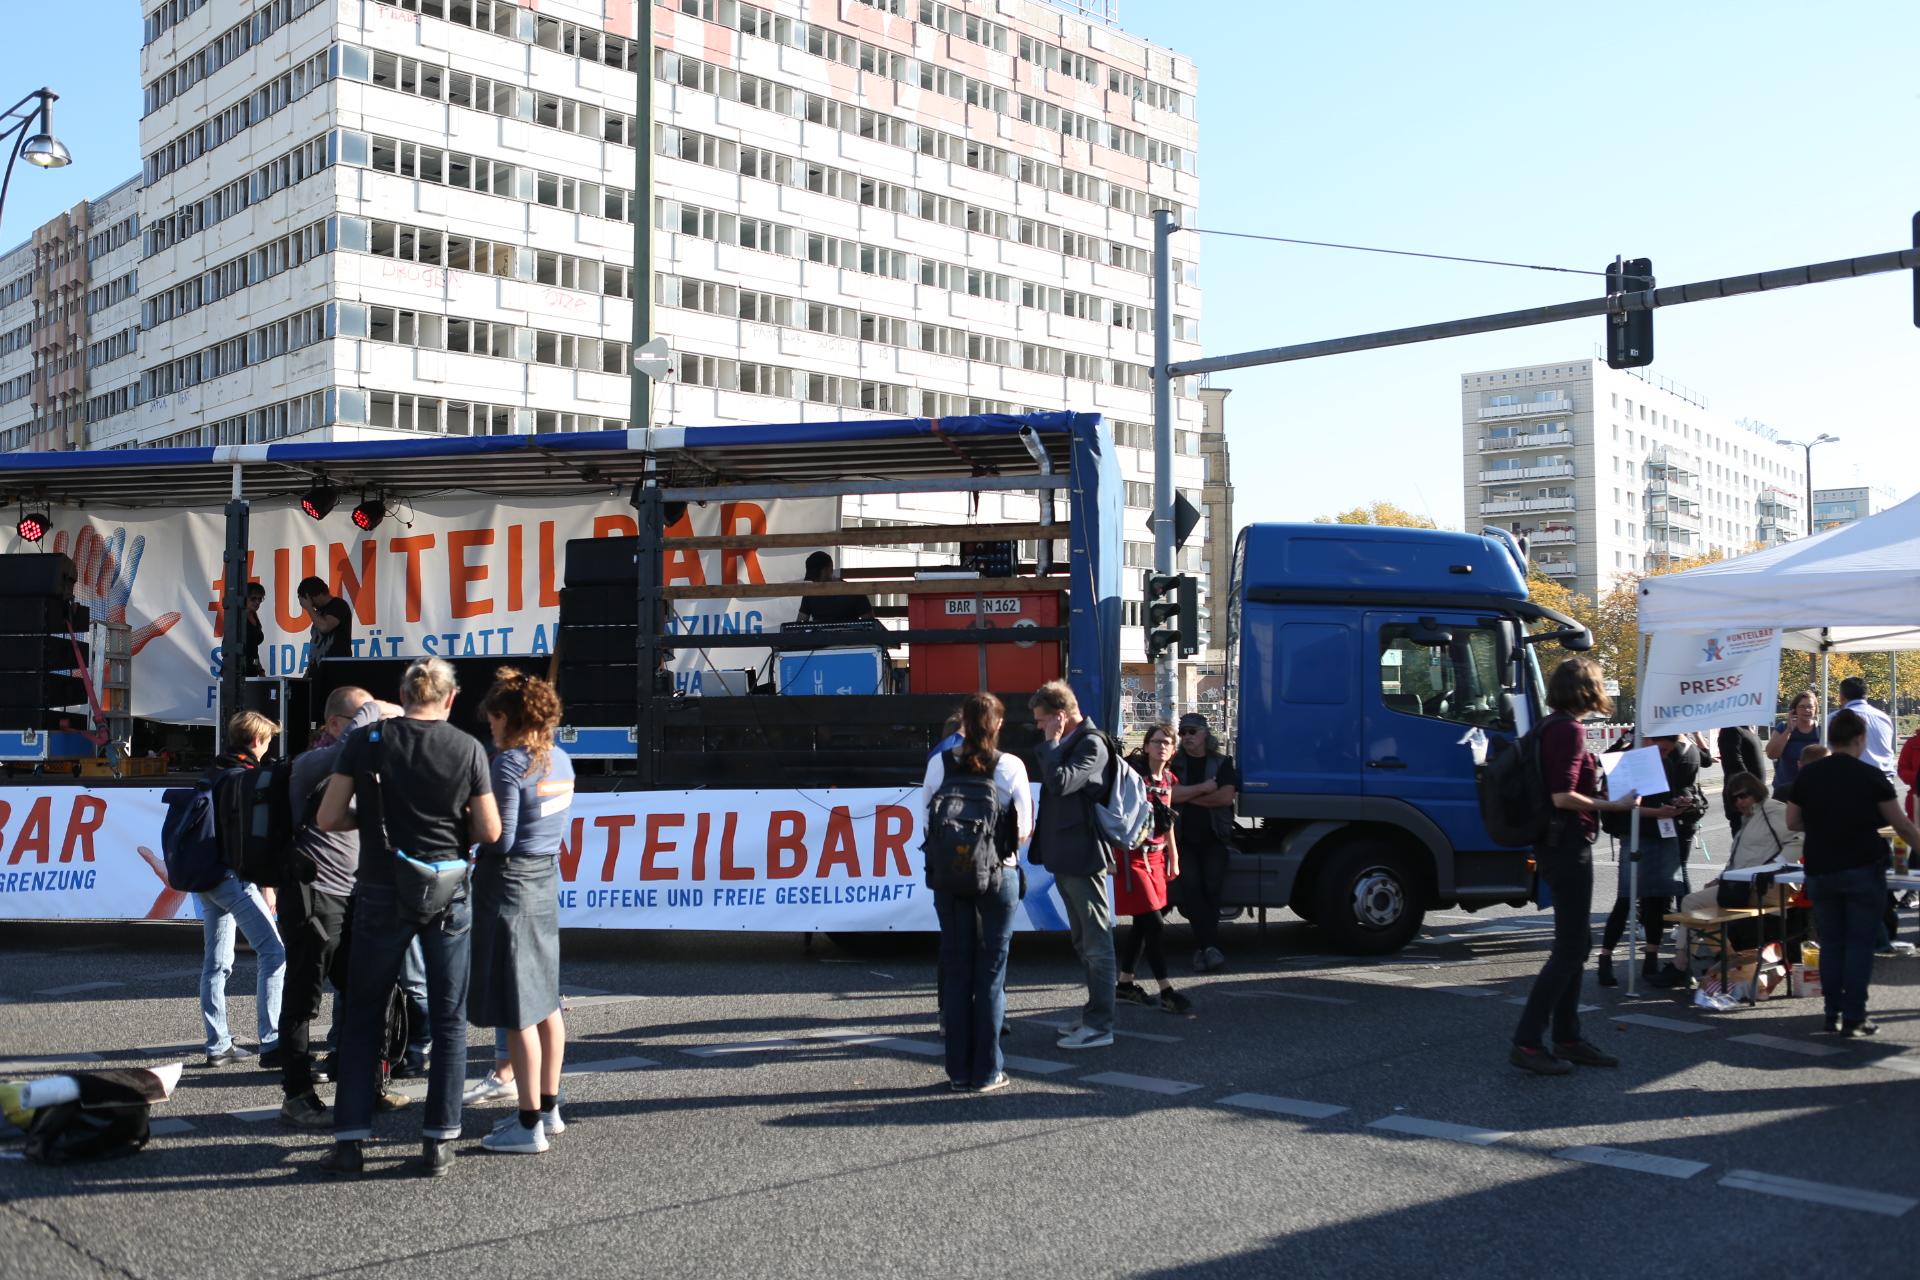 Demo Dresden | unteilbar org